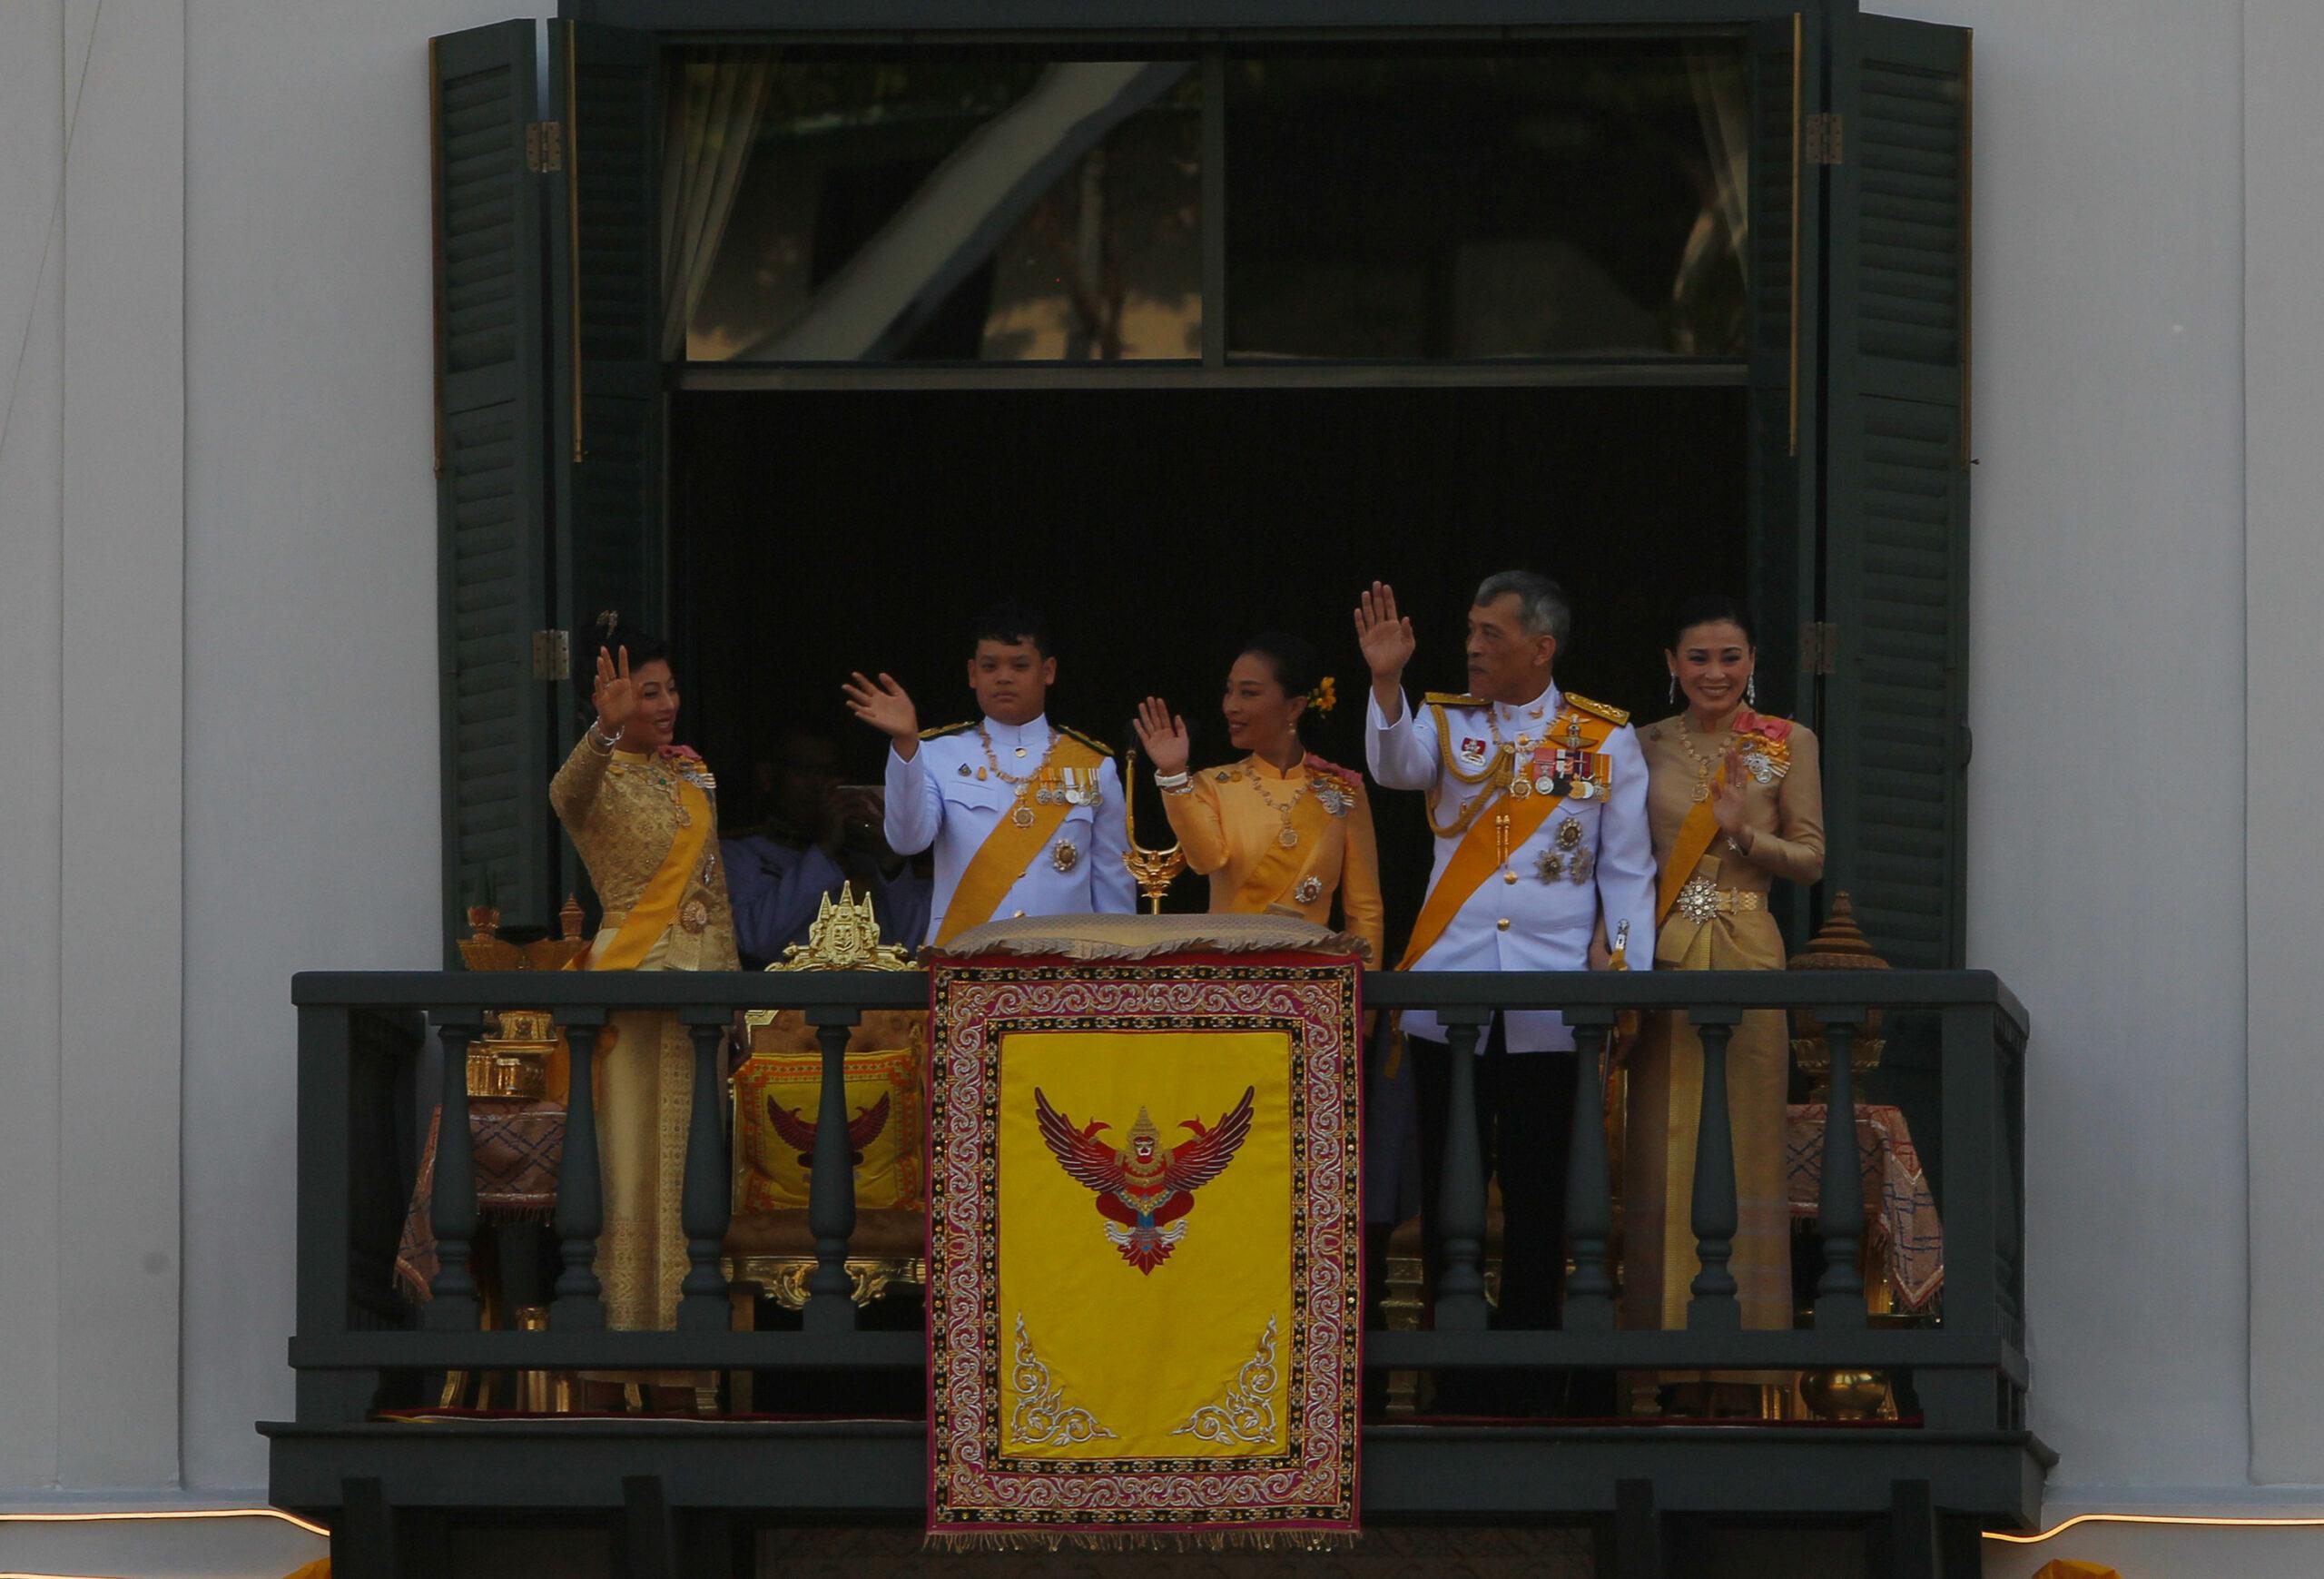 Thai Royal Family eat